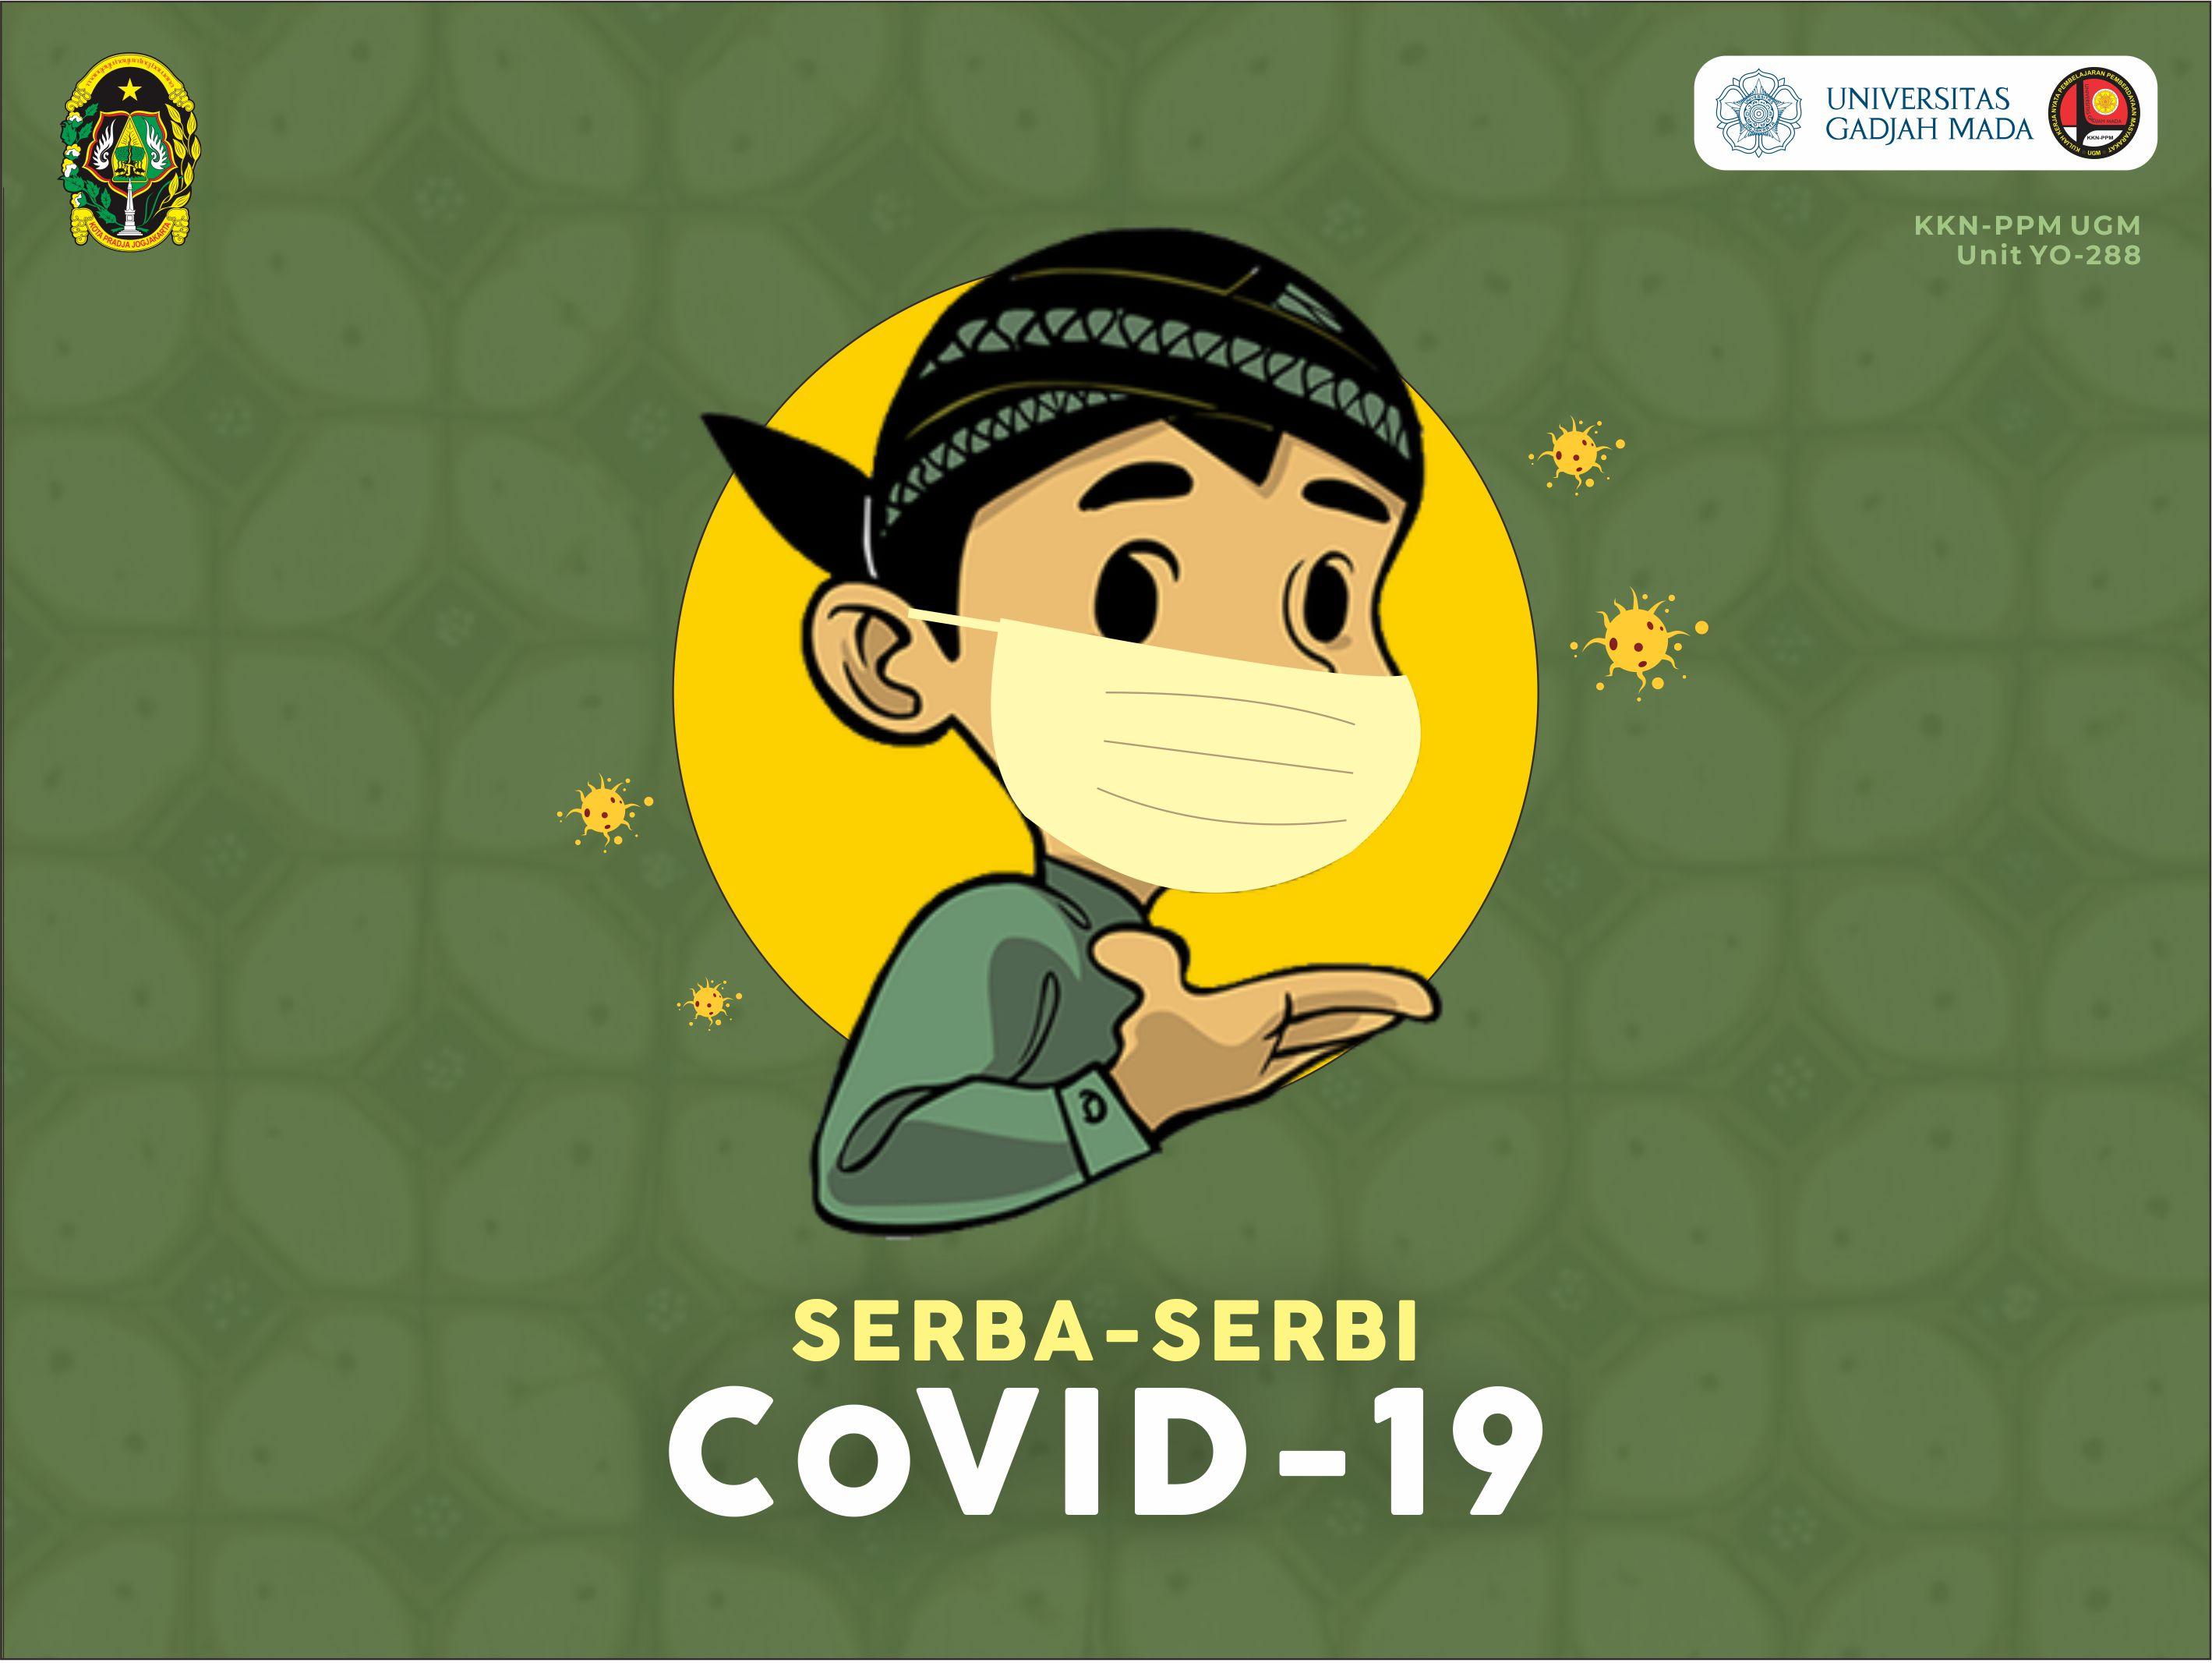 Serba-Serbi CoVID-19